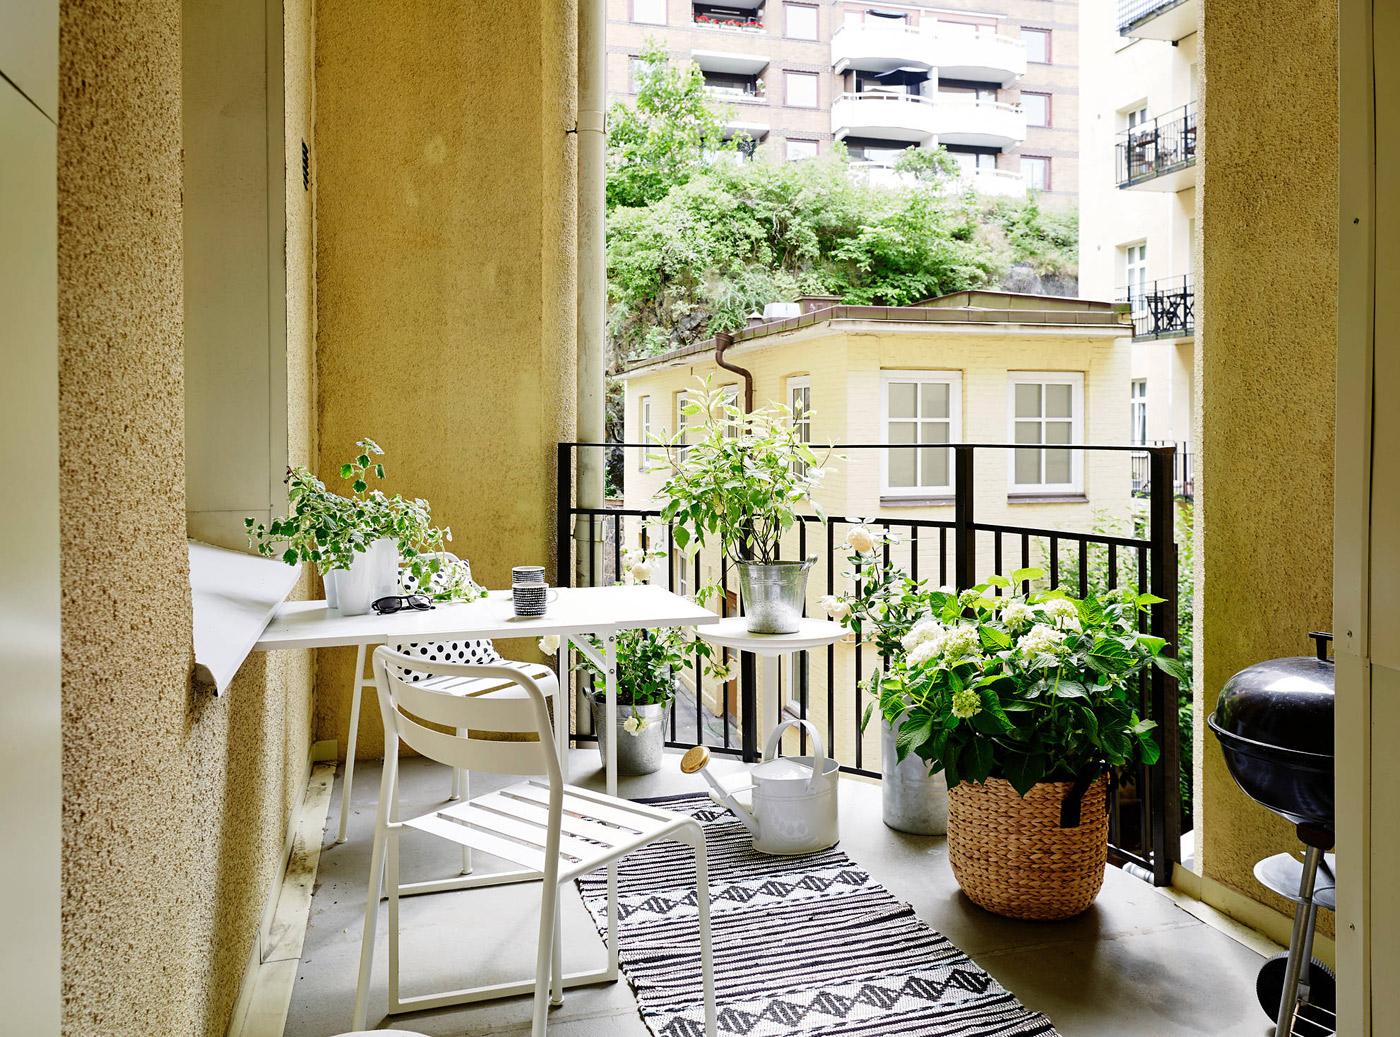 pohodov skandin vsk interi r designville. Black Bedroom Furniture Sets. Home Design Ideas